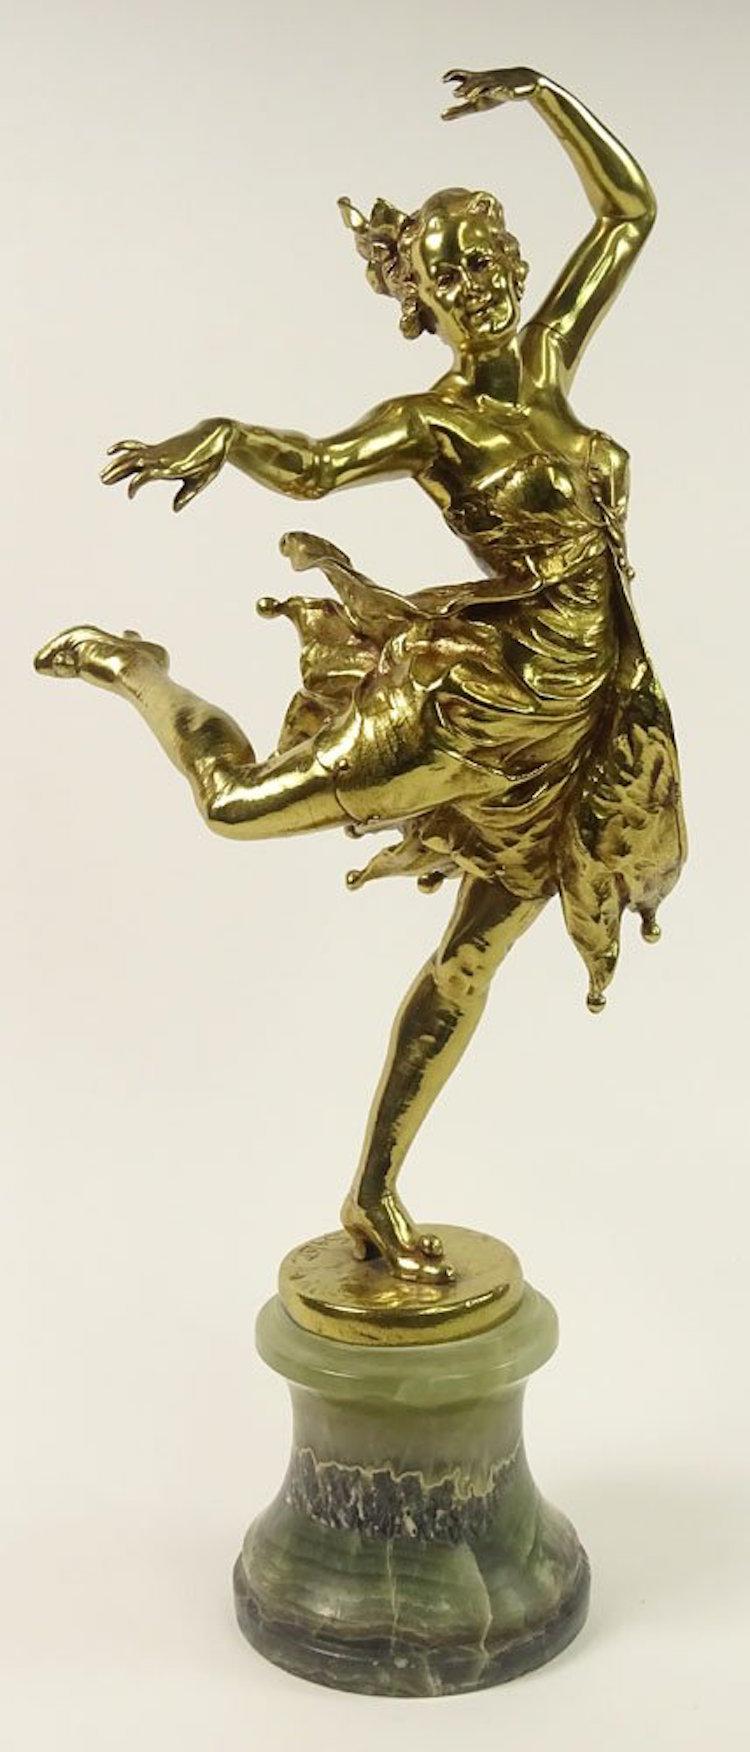 "Leon Salat (Early 20th Century), Continental School Bronze Sculpture on Onyx Plinth ""Dancer"". Estimate $500 – $700. Photo via Kodner Gallery"